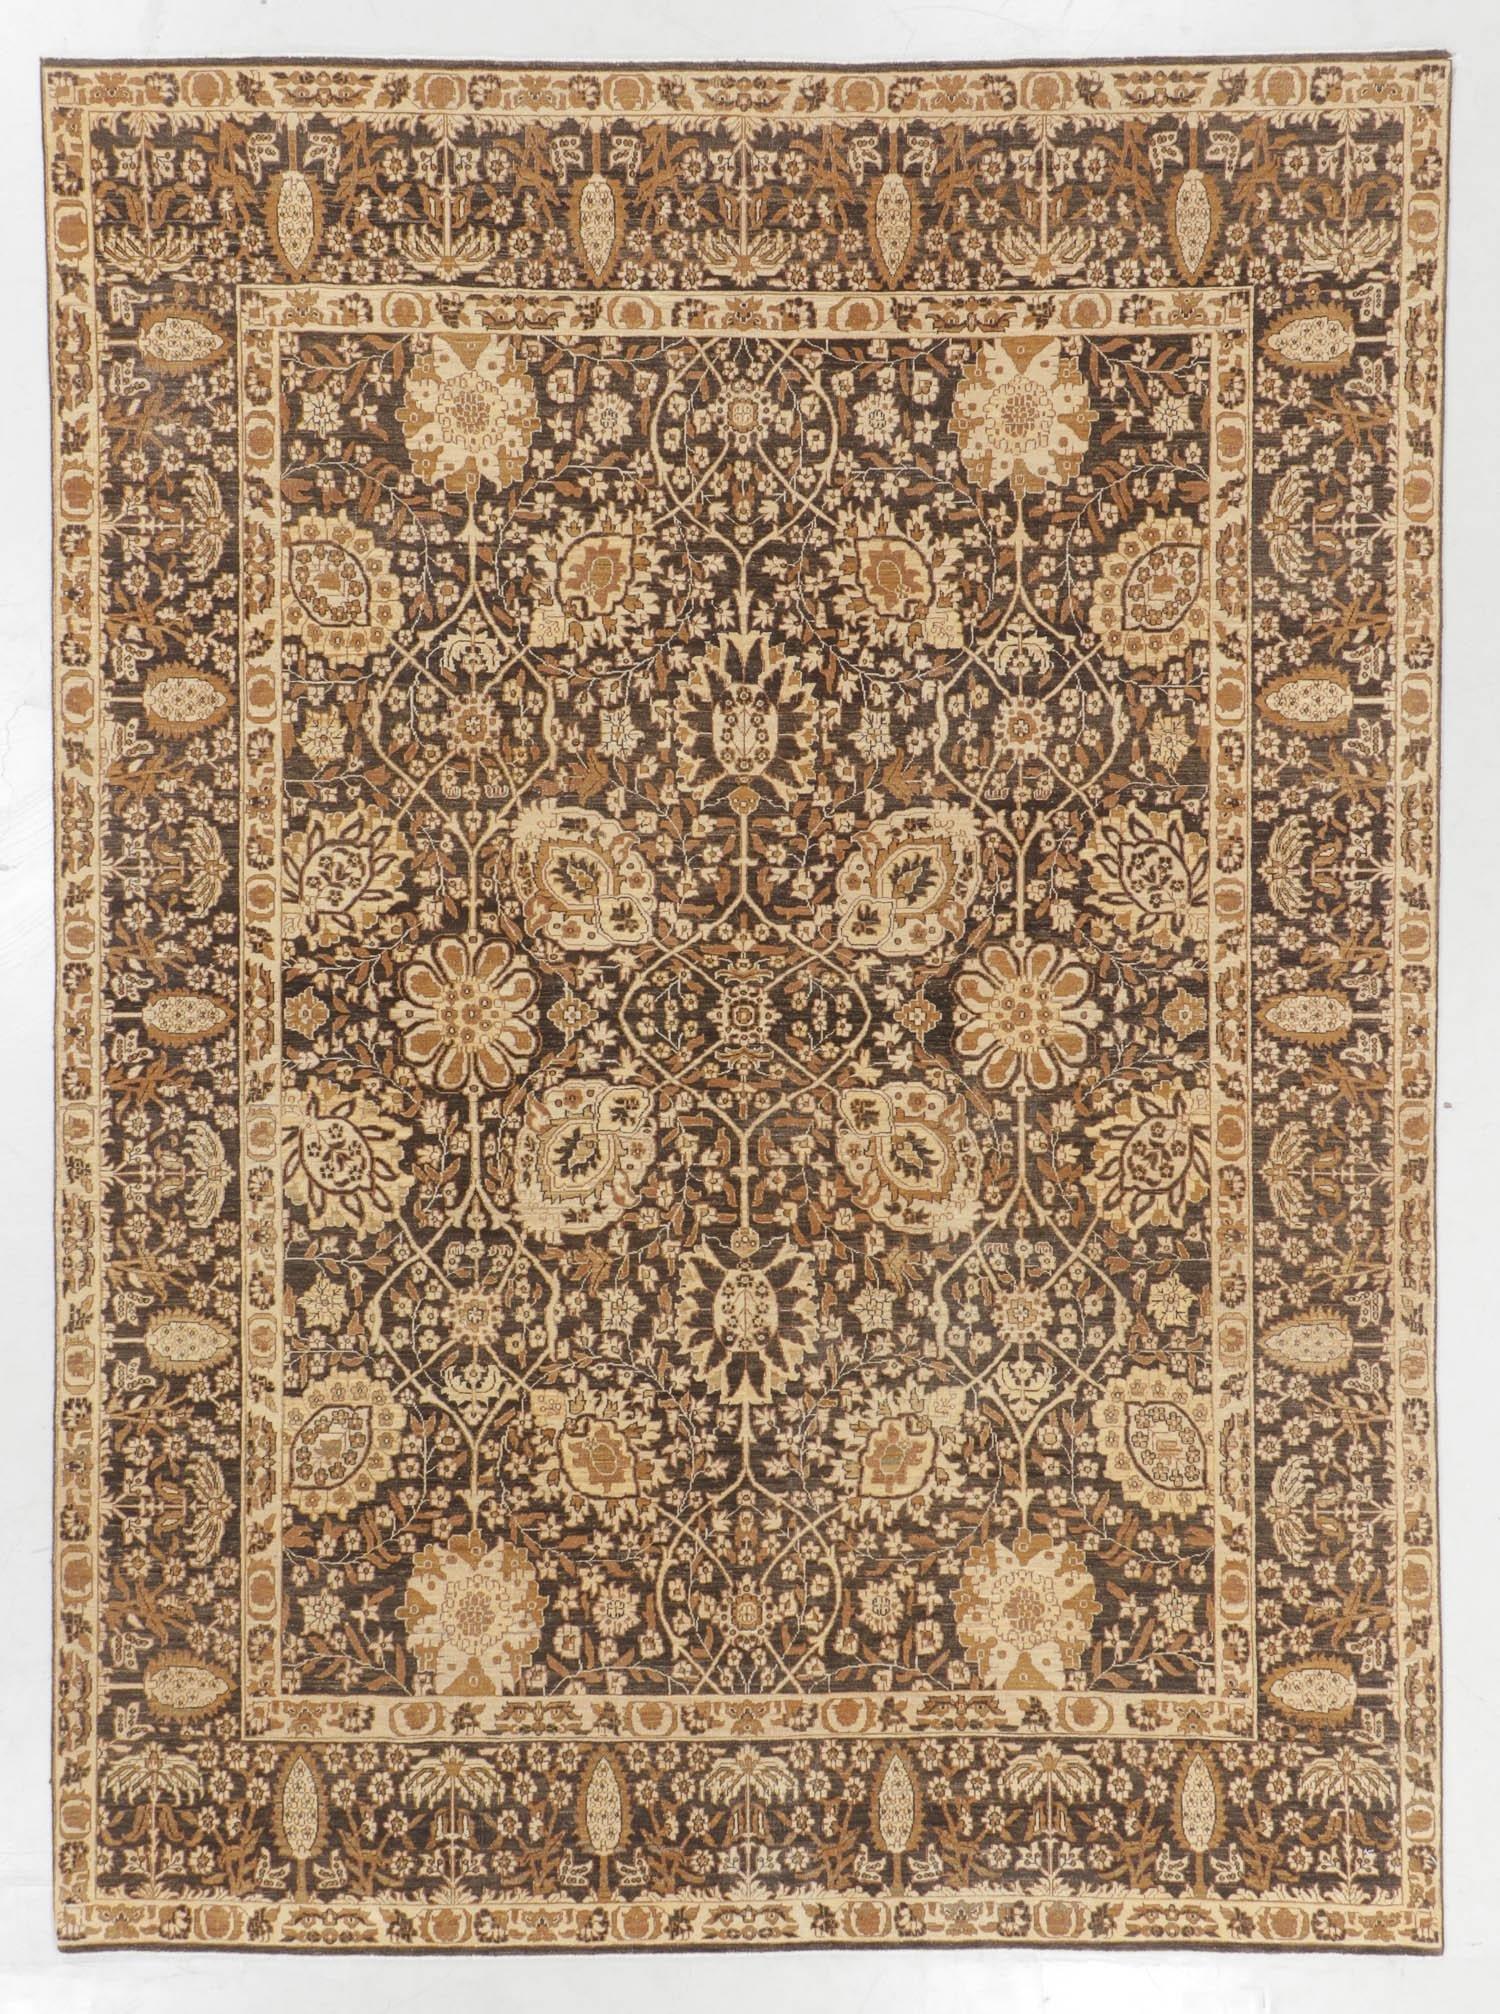 Tabriz Style Rug, India, Late 20th C., 8'0'' x 10'10''